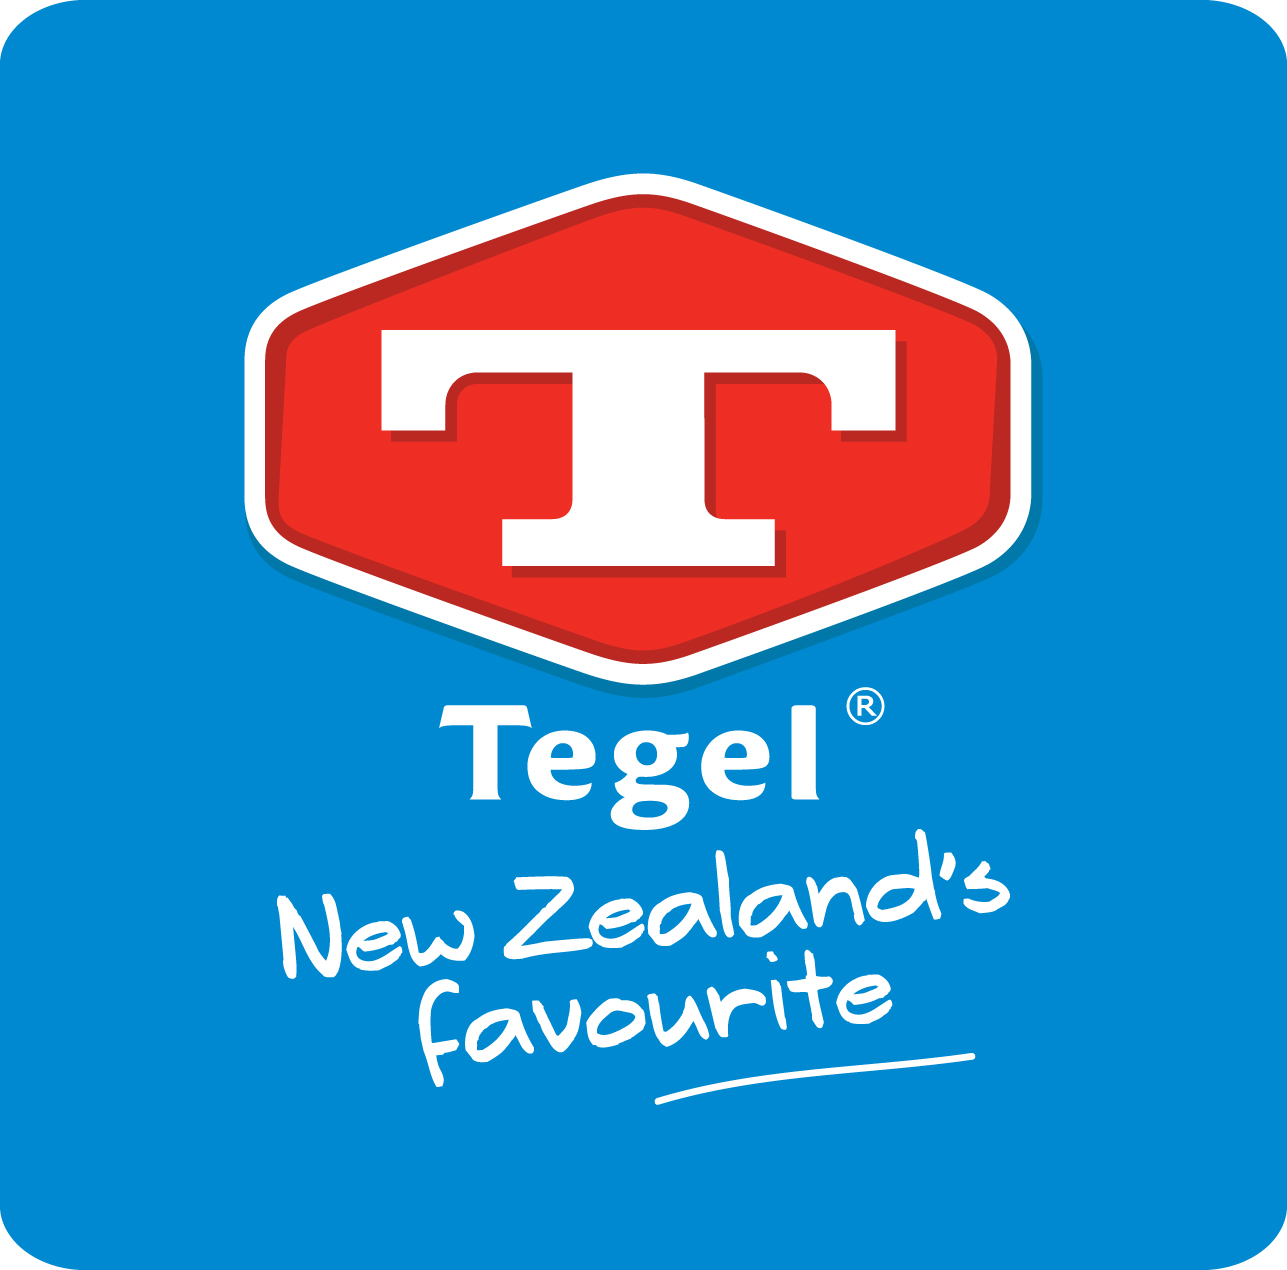 Tegel-NZ fav_logo_spot.jpg